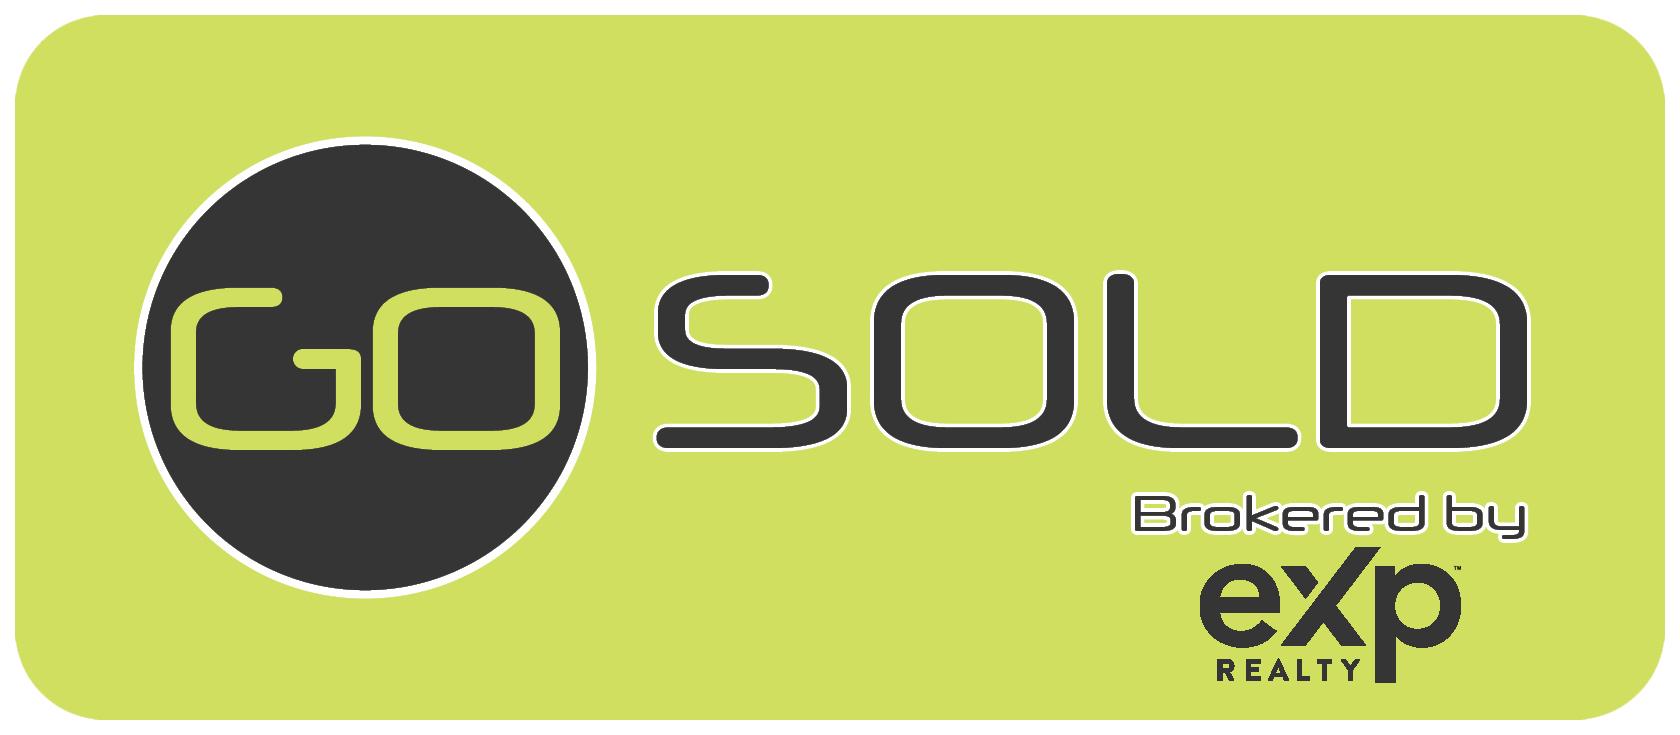 Go Sold Homes logo